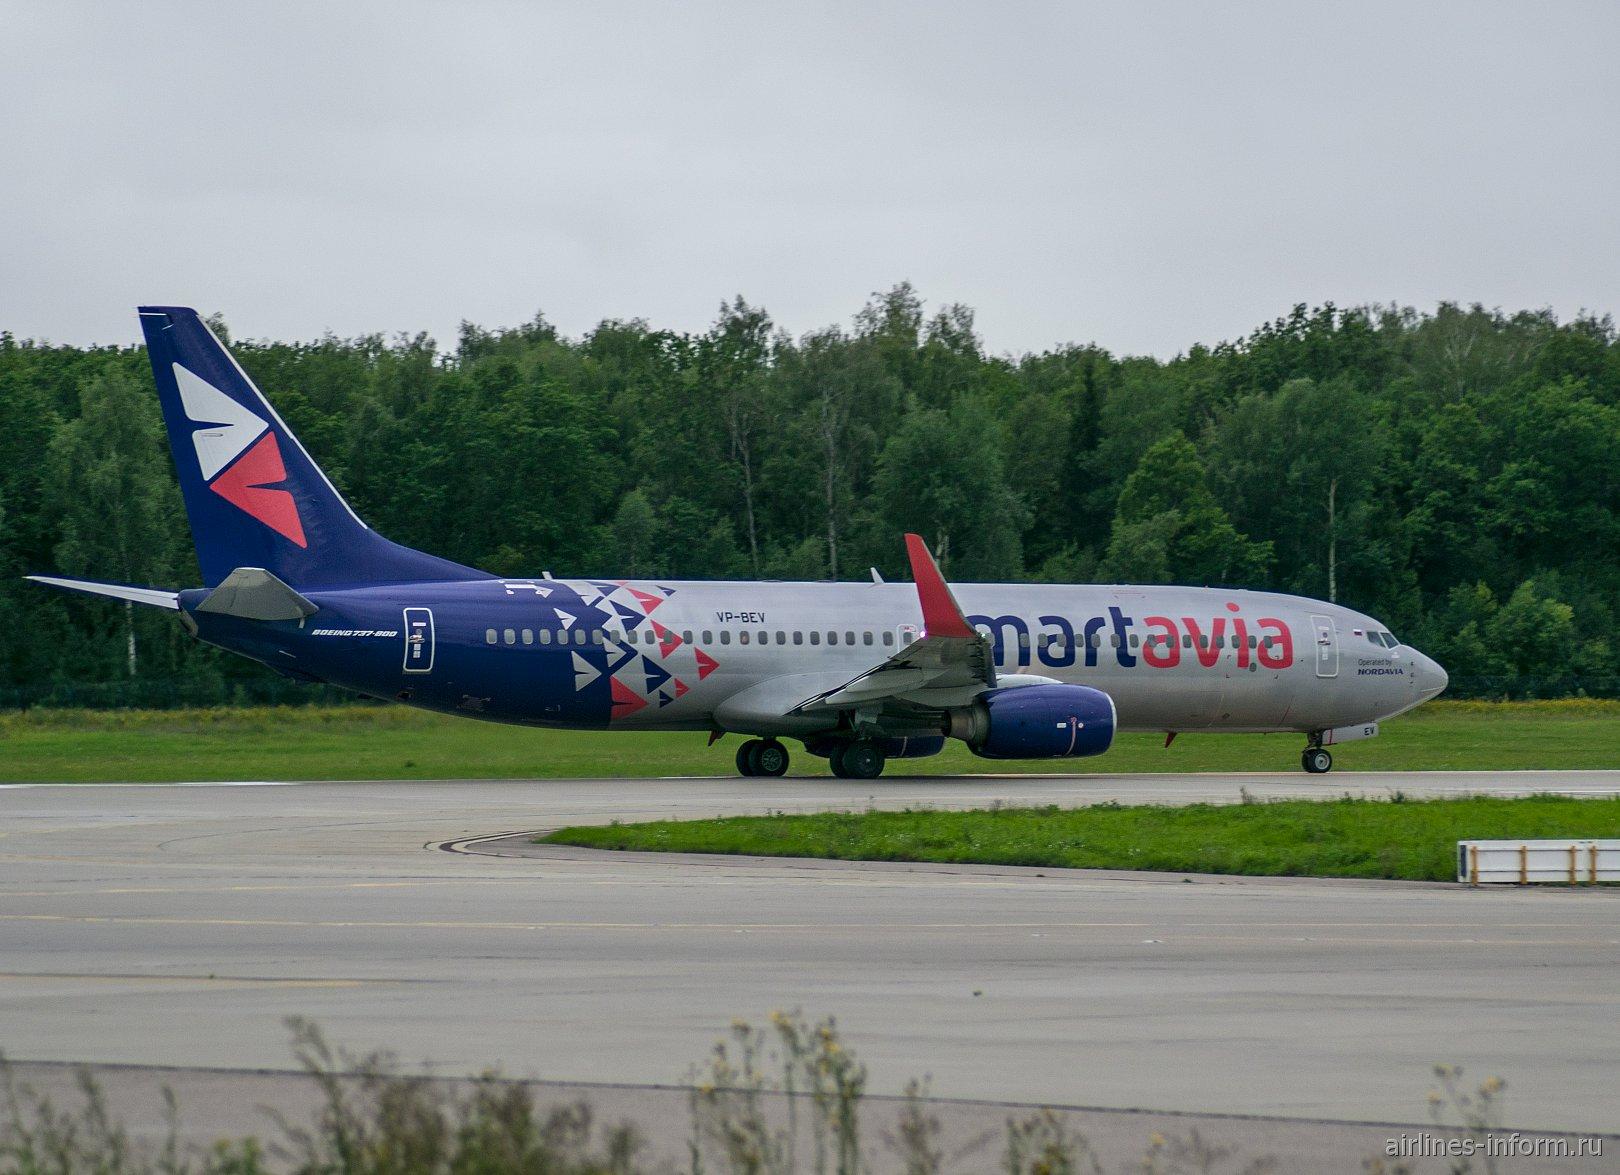 Боинг-737-800 VP-BEV авиакомпании Smartavia в аэропорту Домодедово